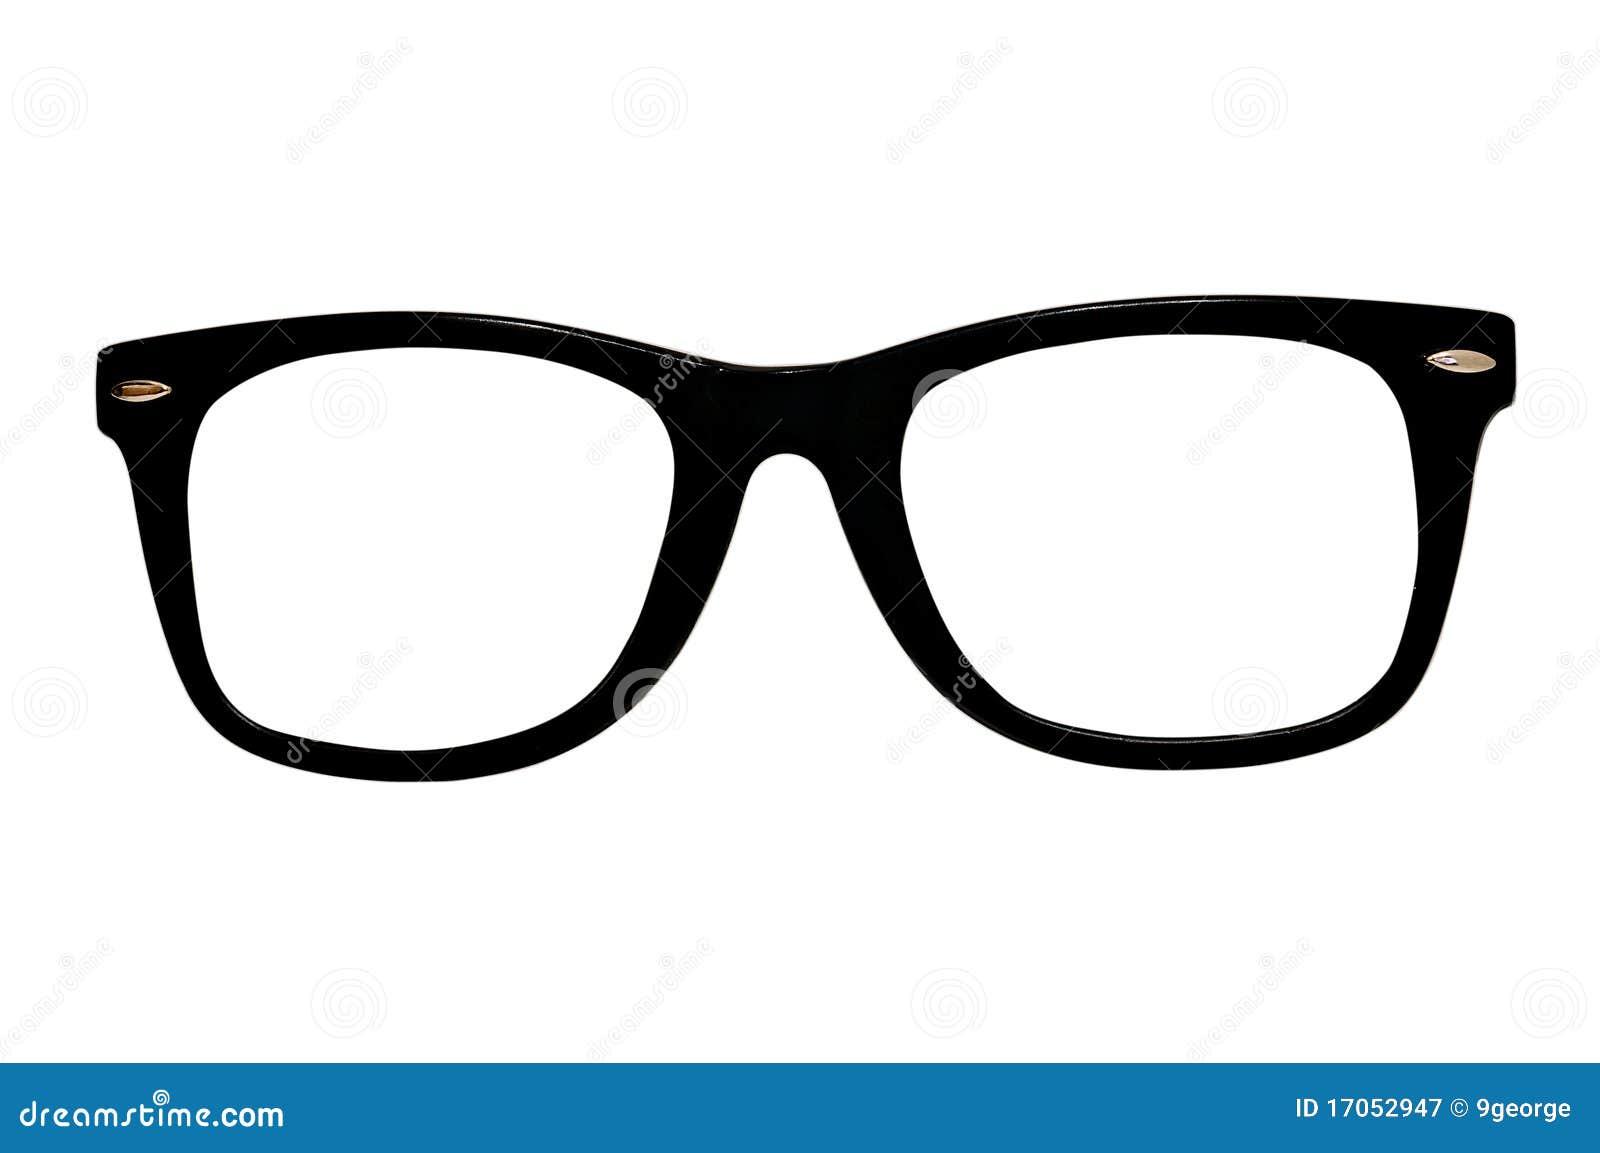 Retro glasses isolated